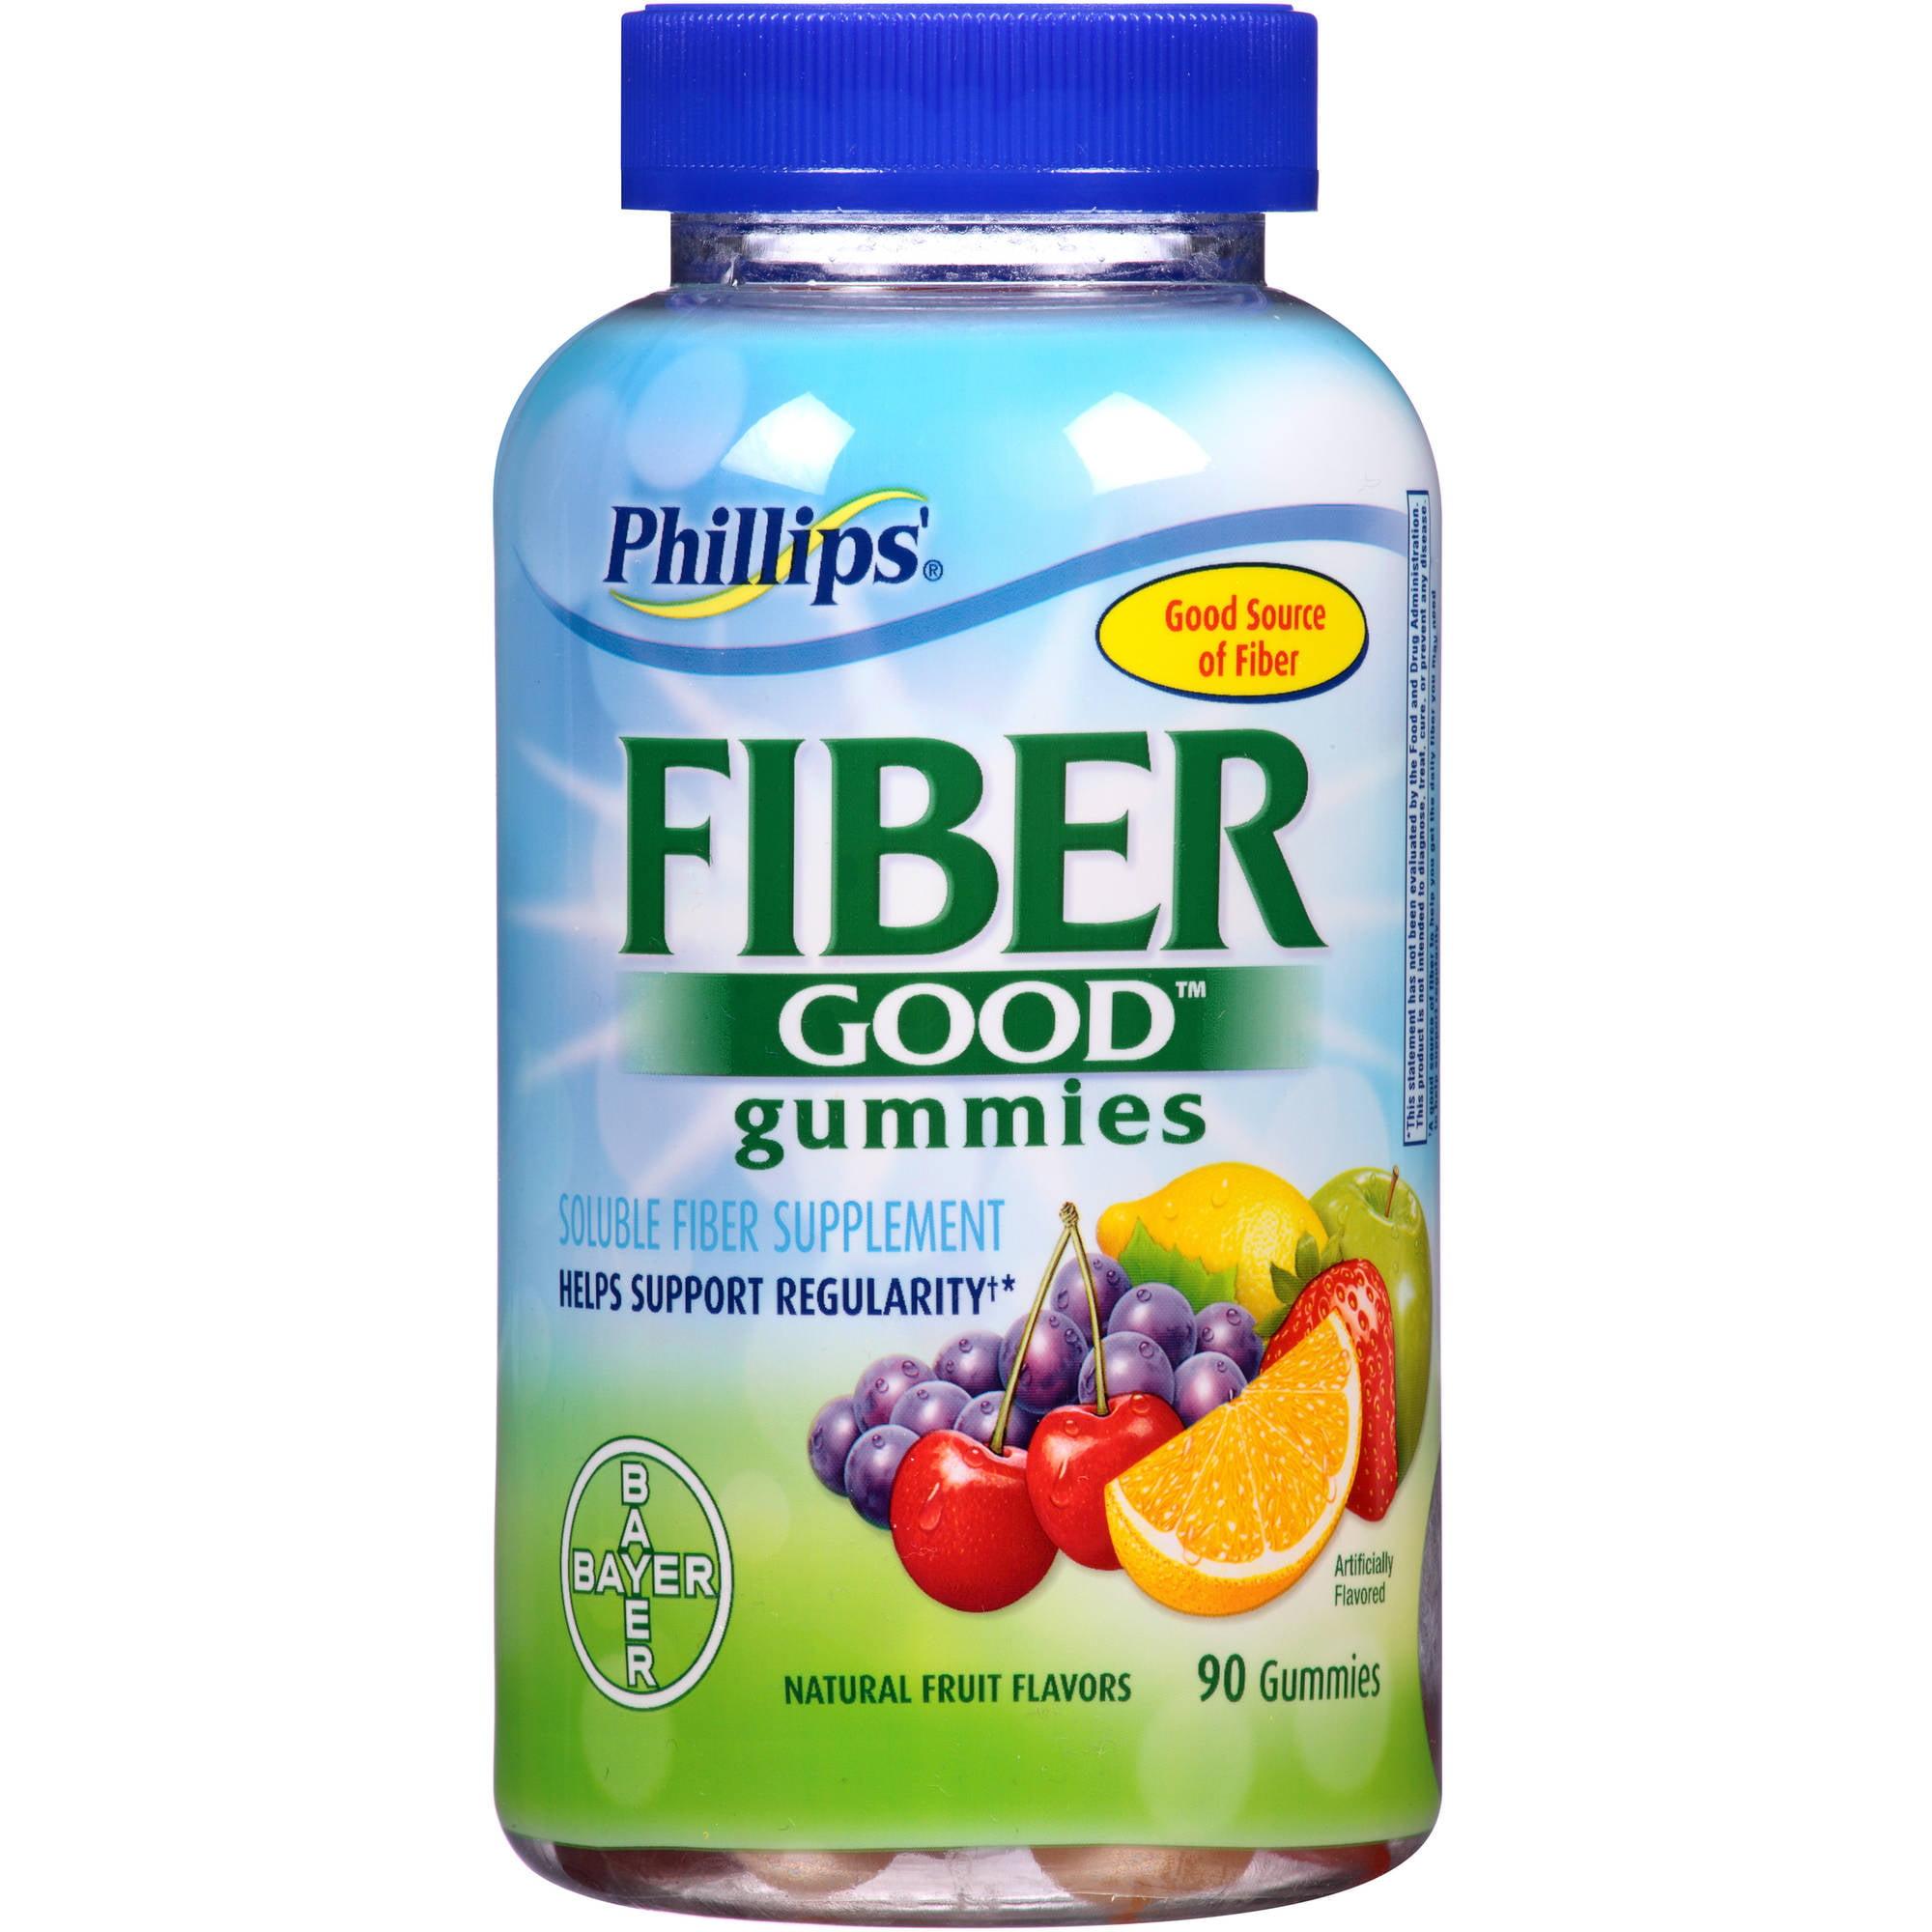 Phillips Fiber Good Gummies Fiber Supplement, 90 count